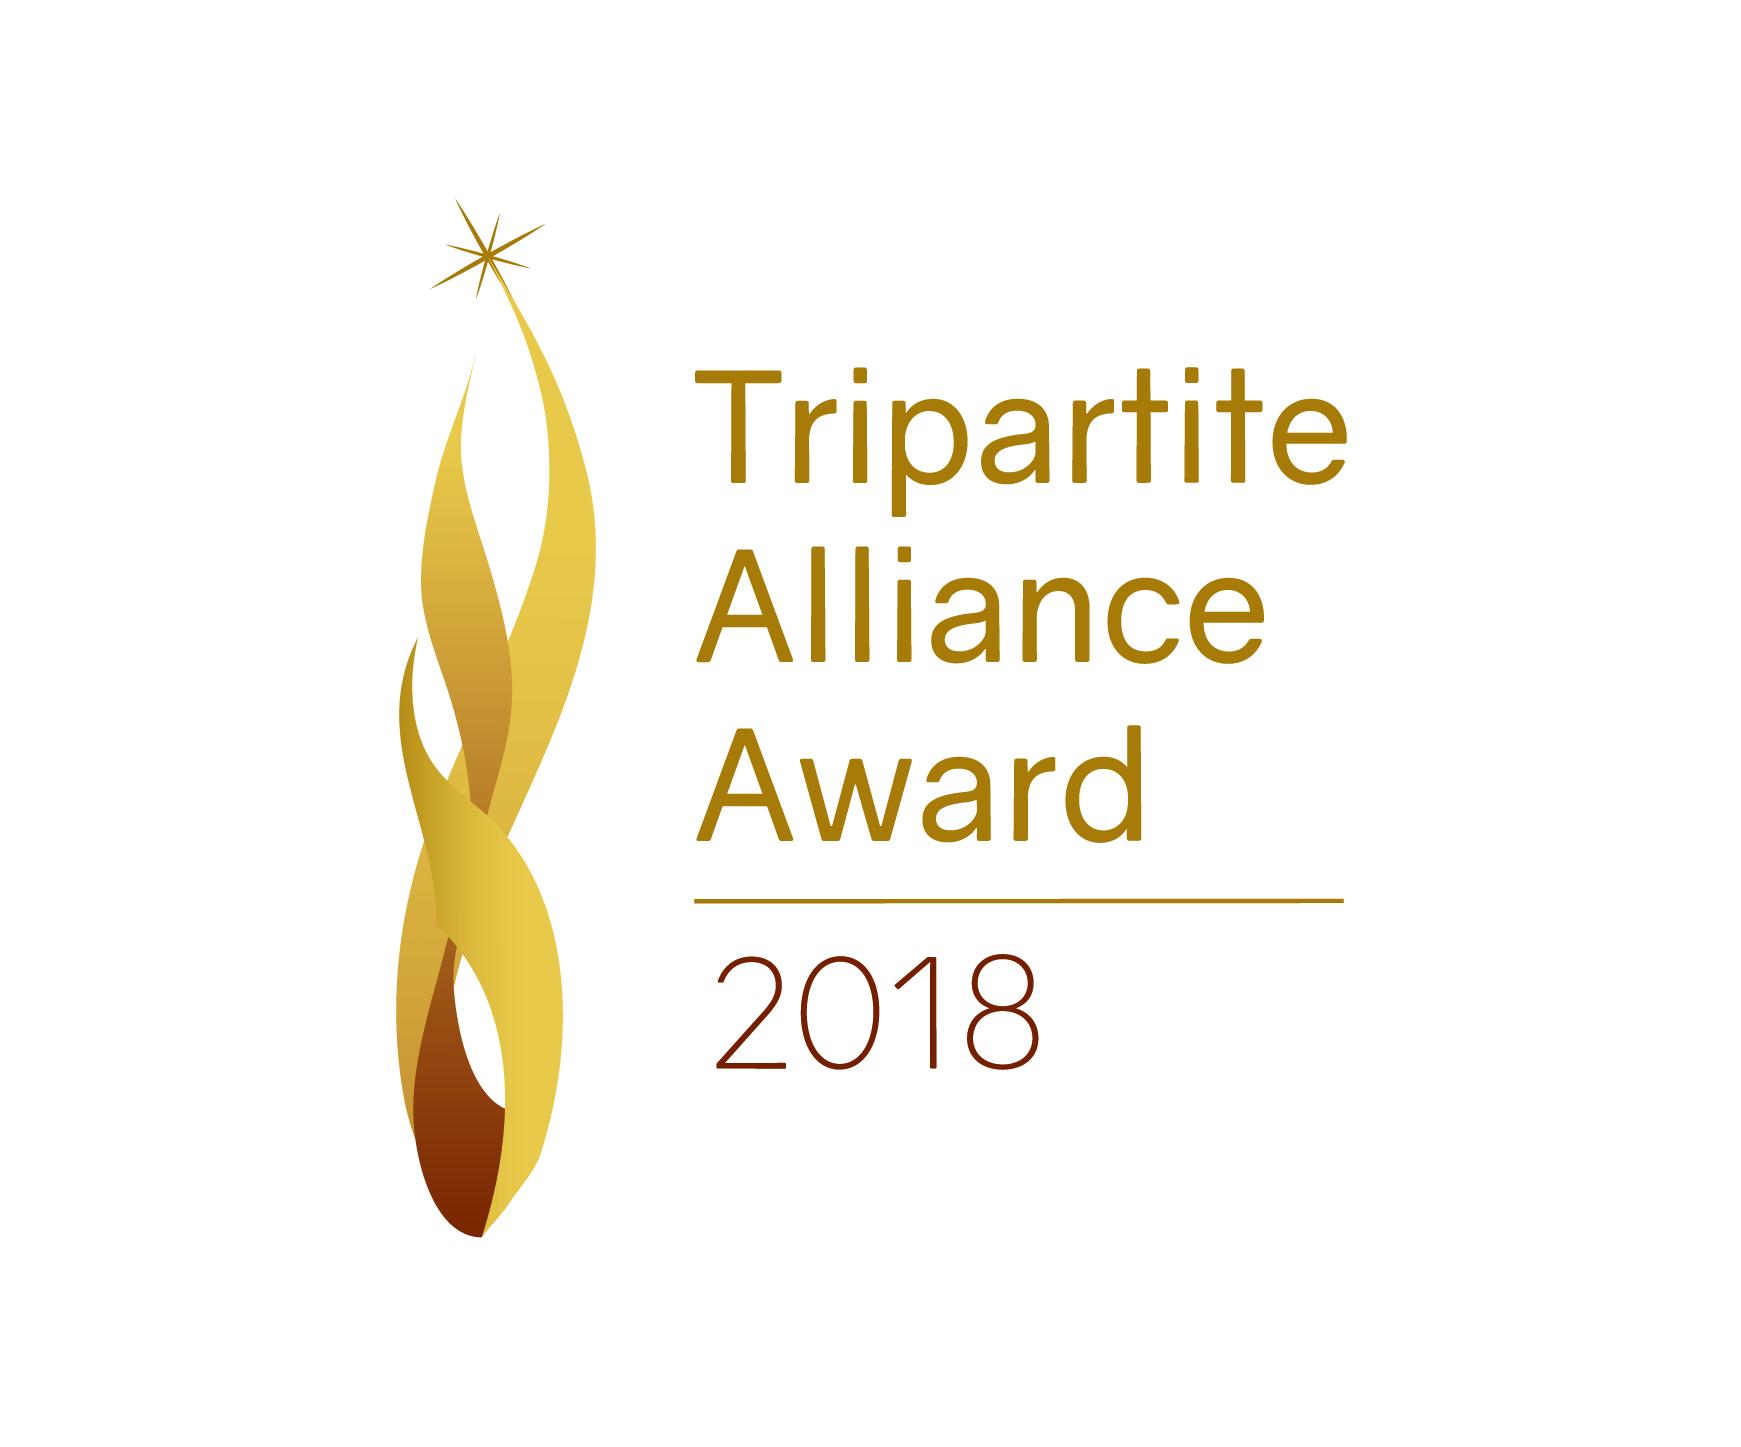 tripartite alliance award 2018